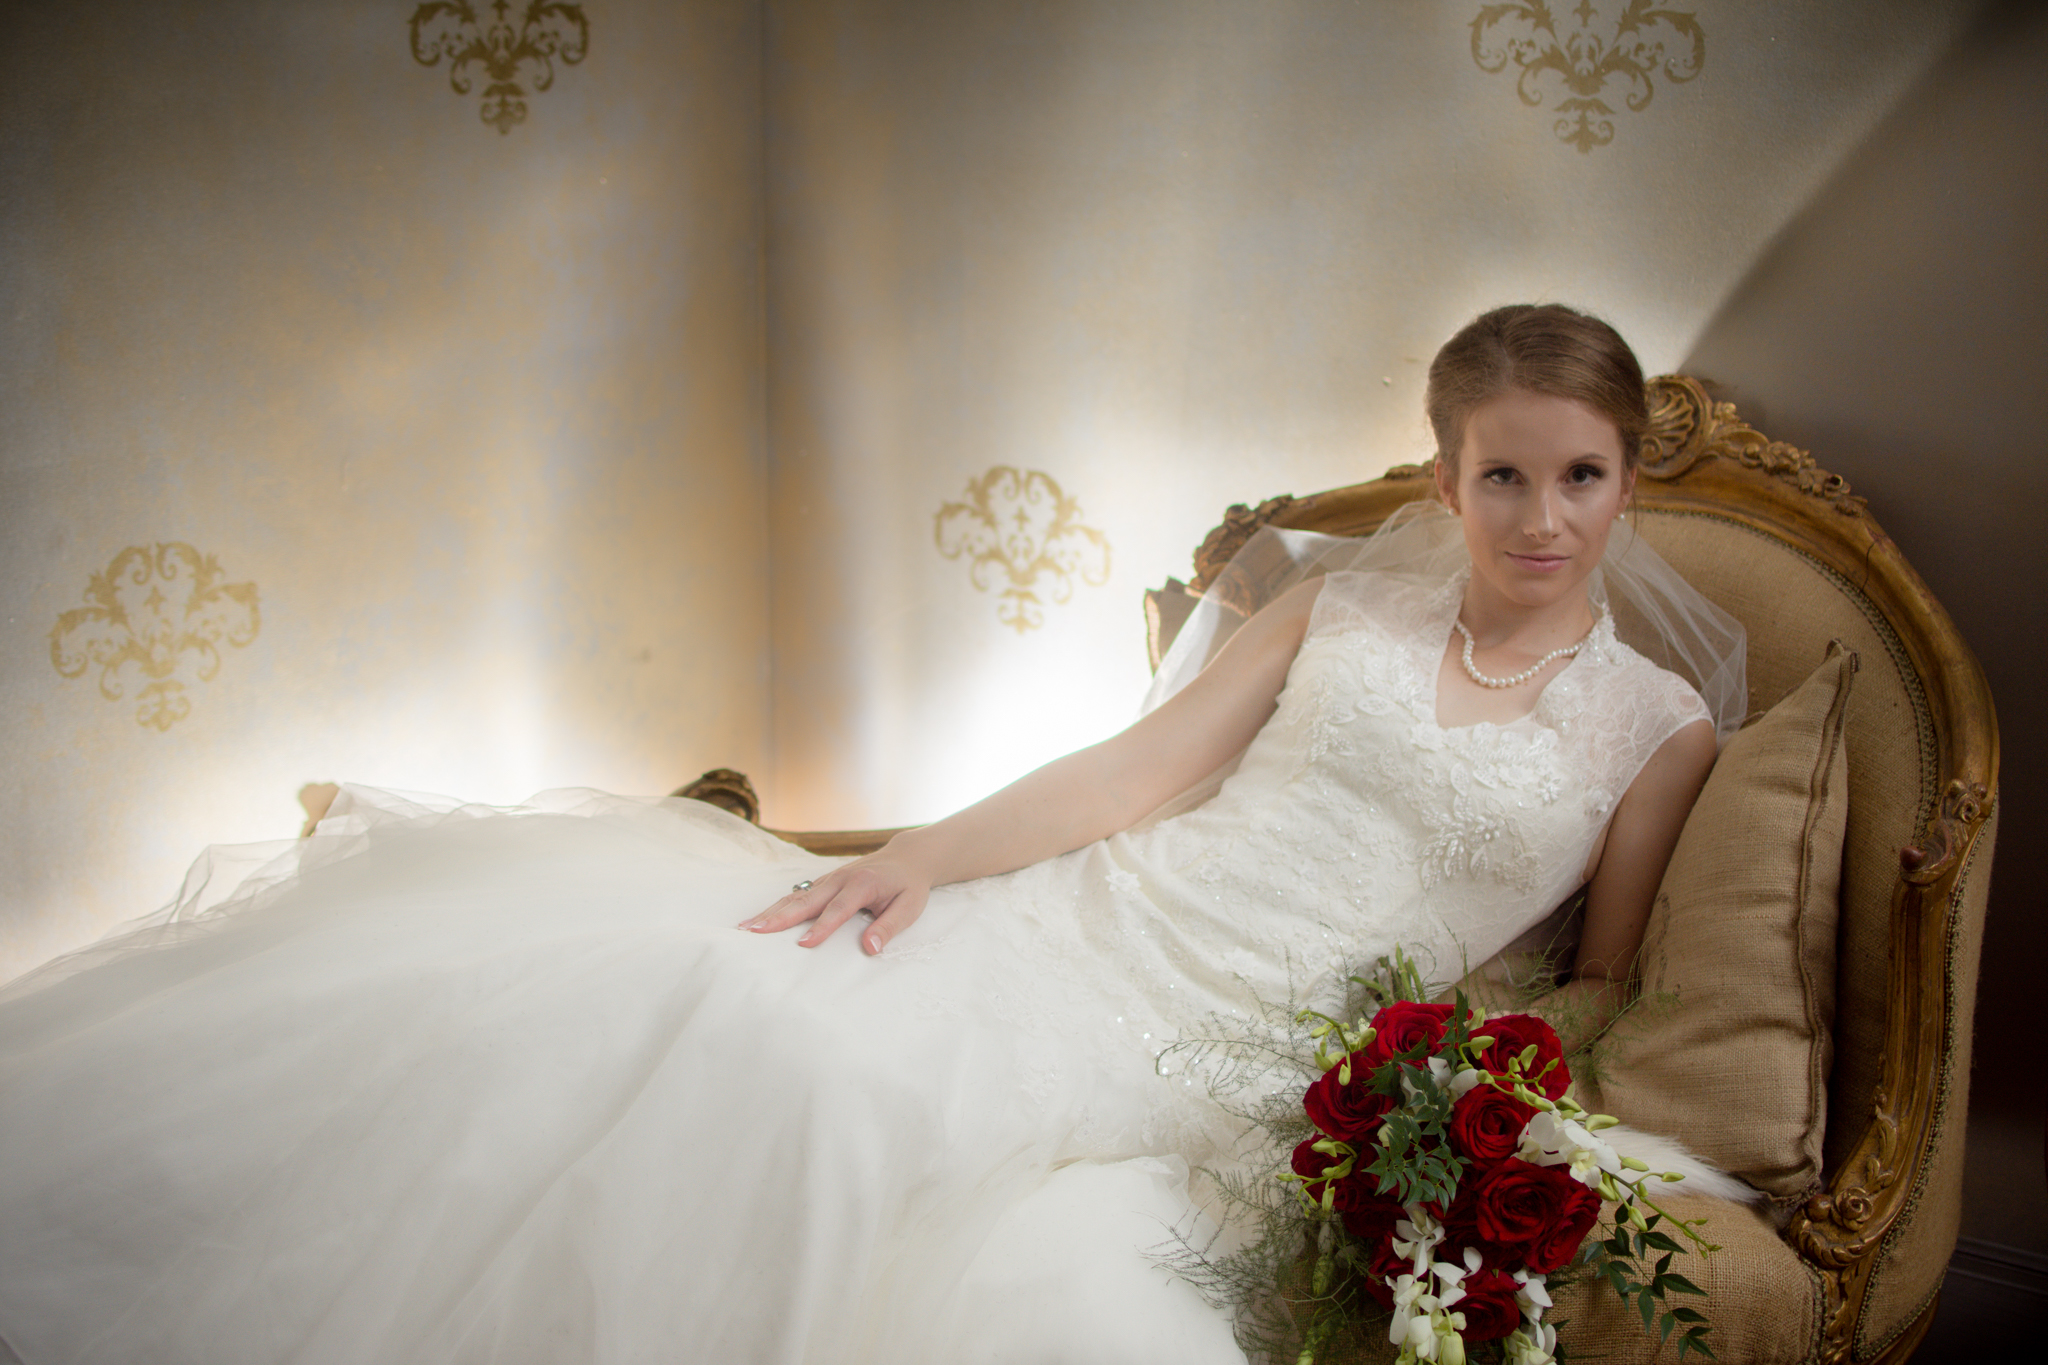 bridalportraits (40 of 49).JPG